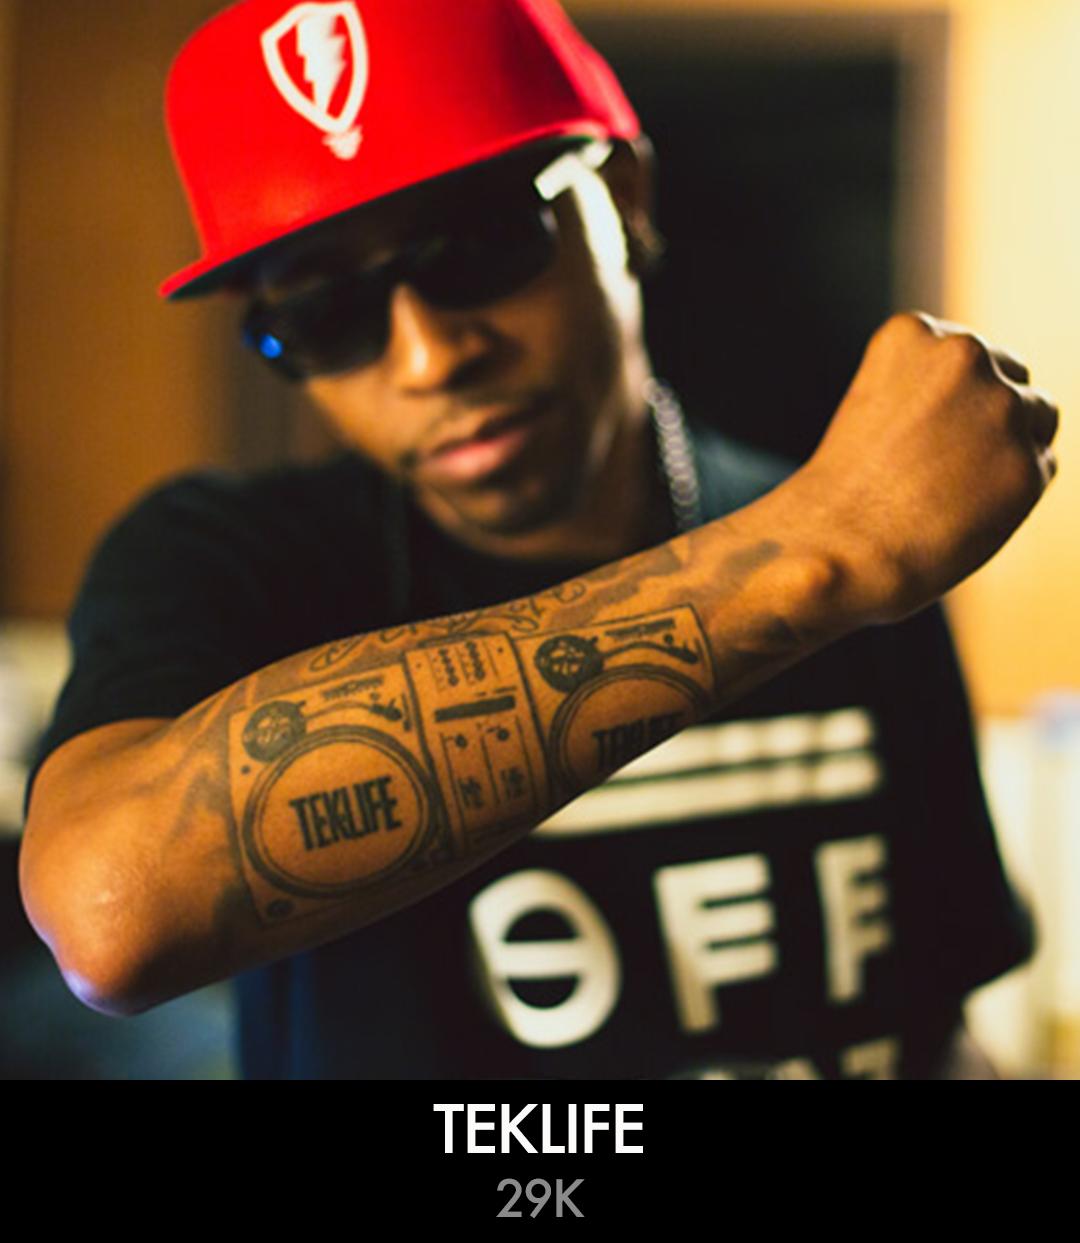 TT_W&B_Deck_Music_Teklife.png